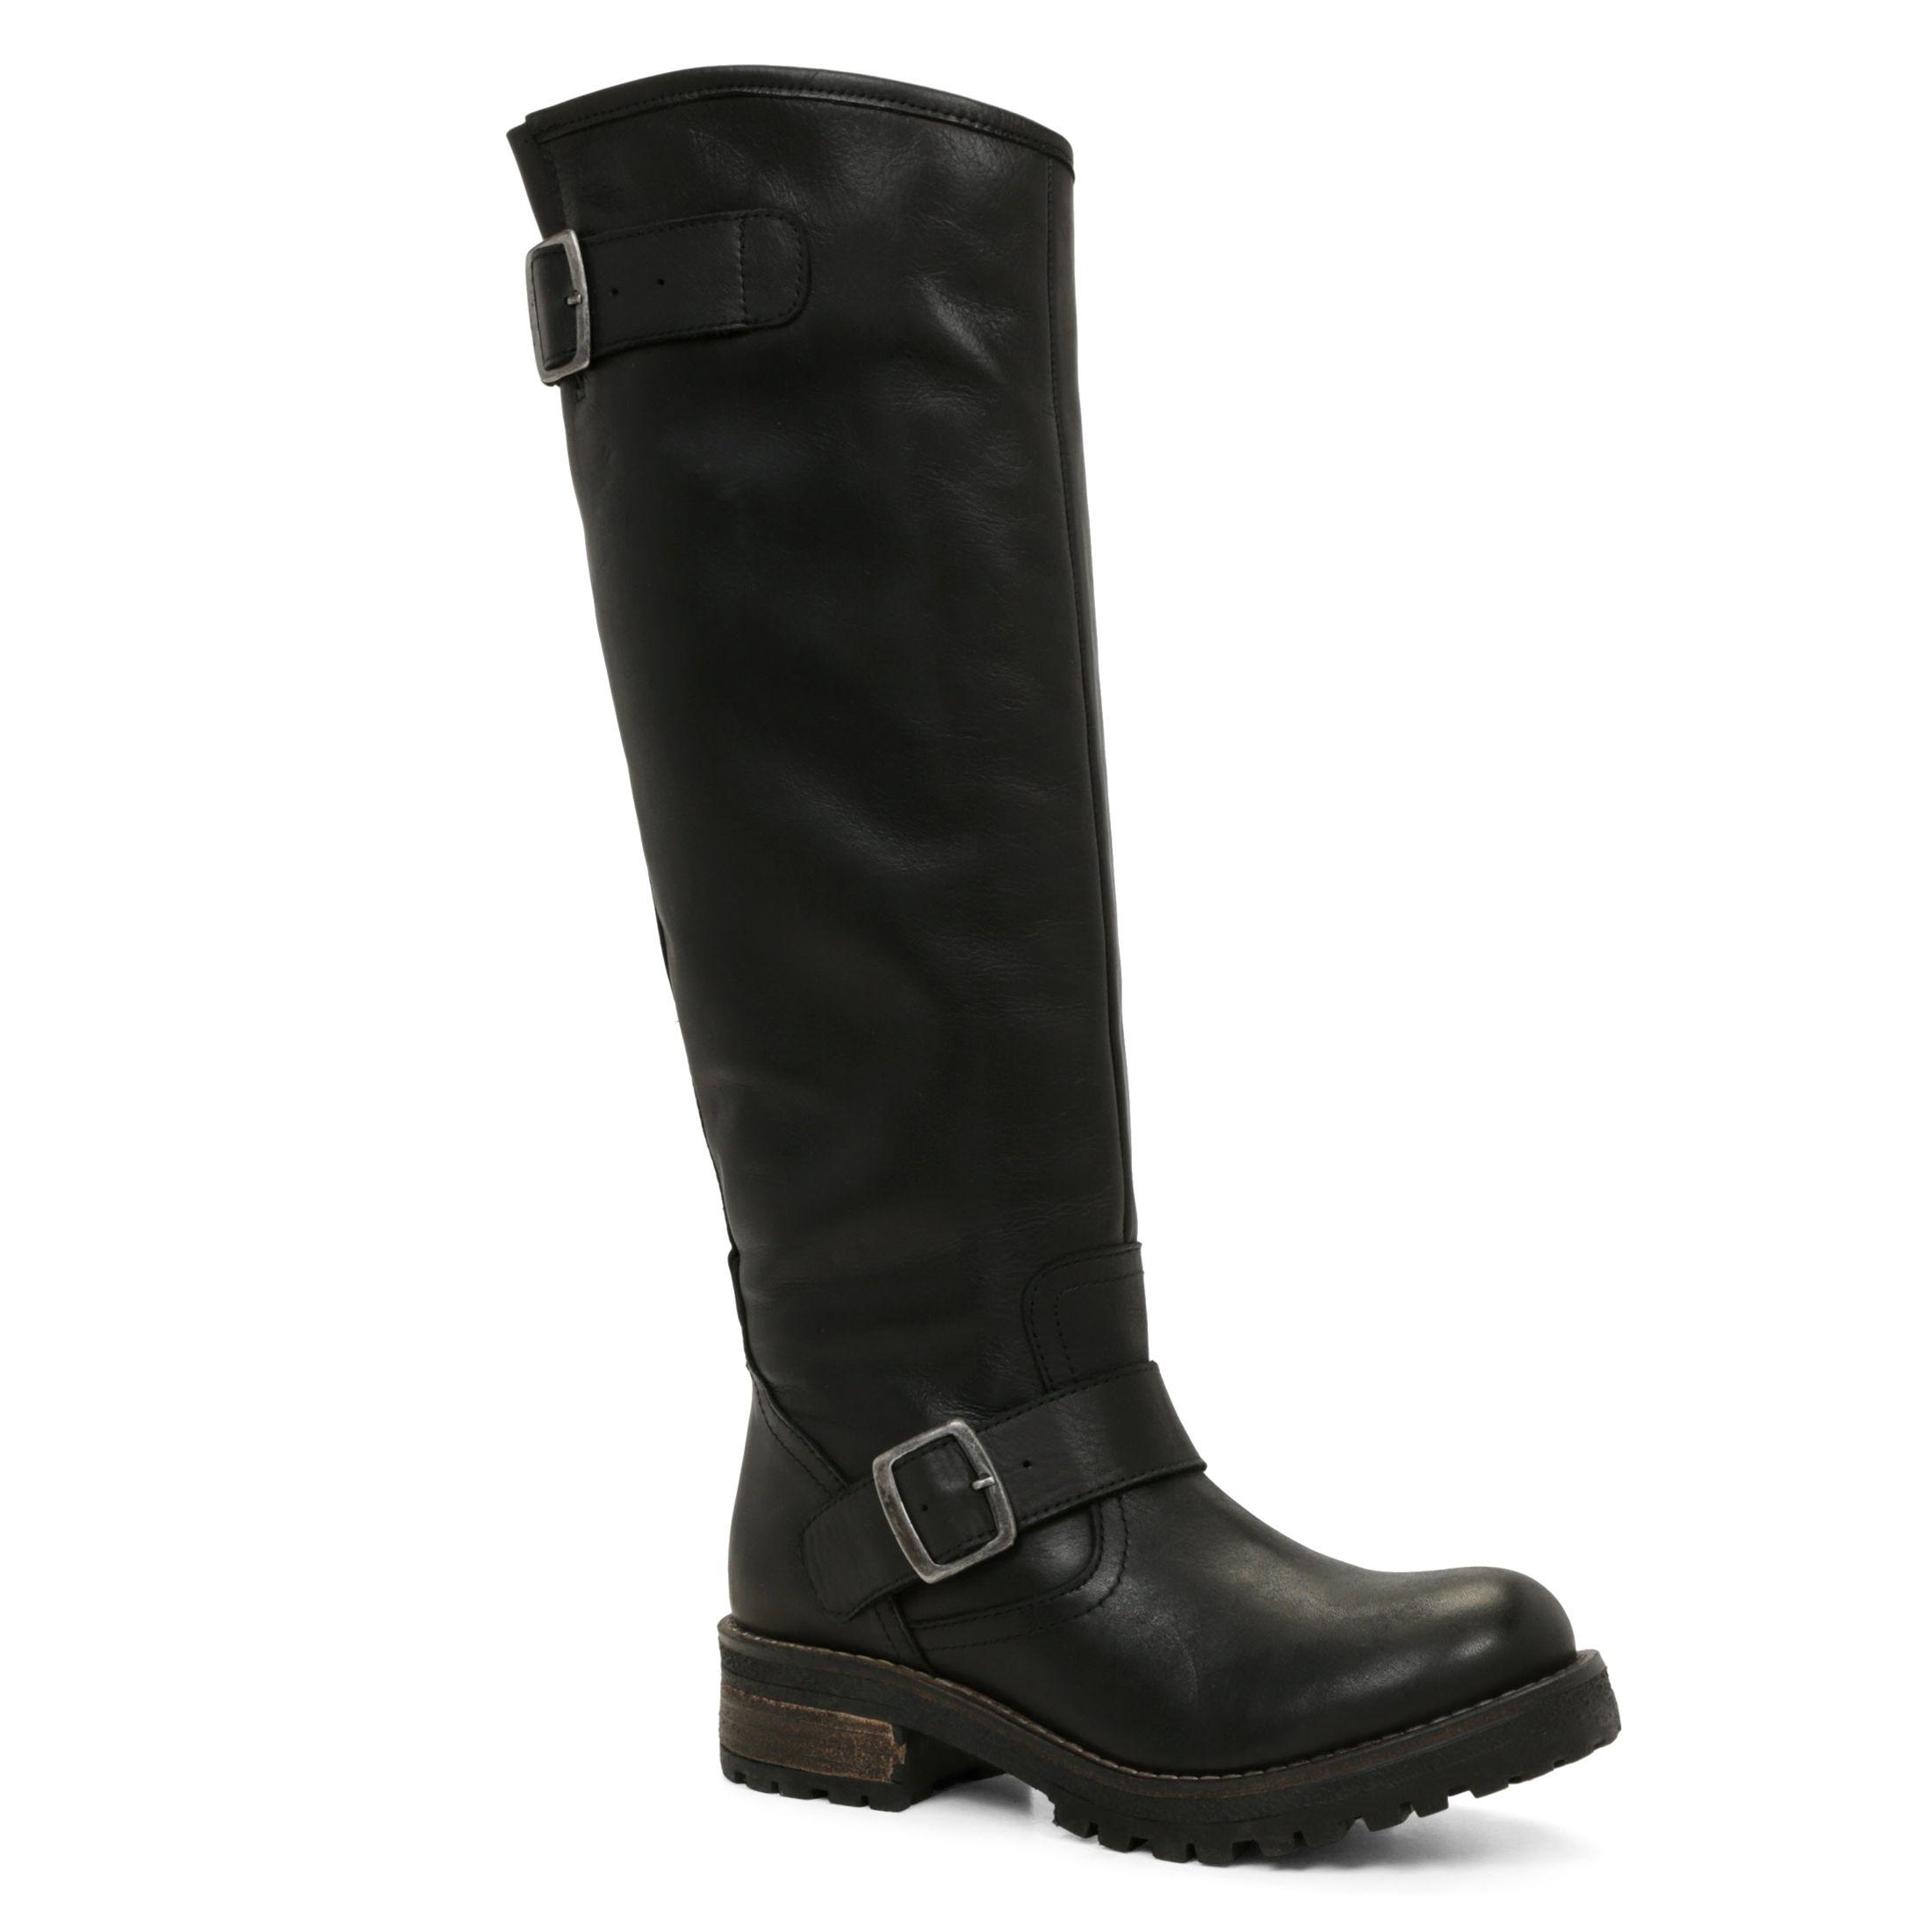 aldo beskra buckle knee high boots in black lyst